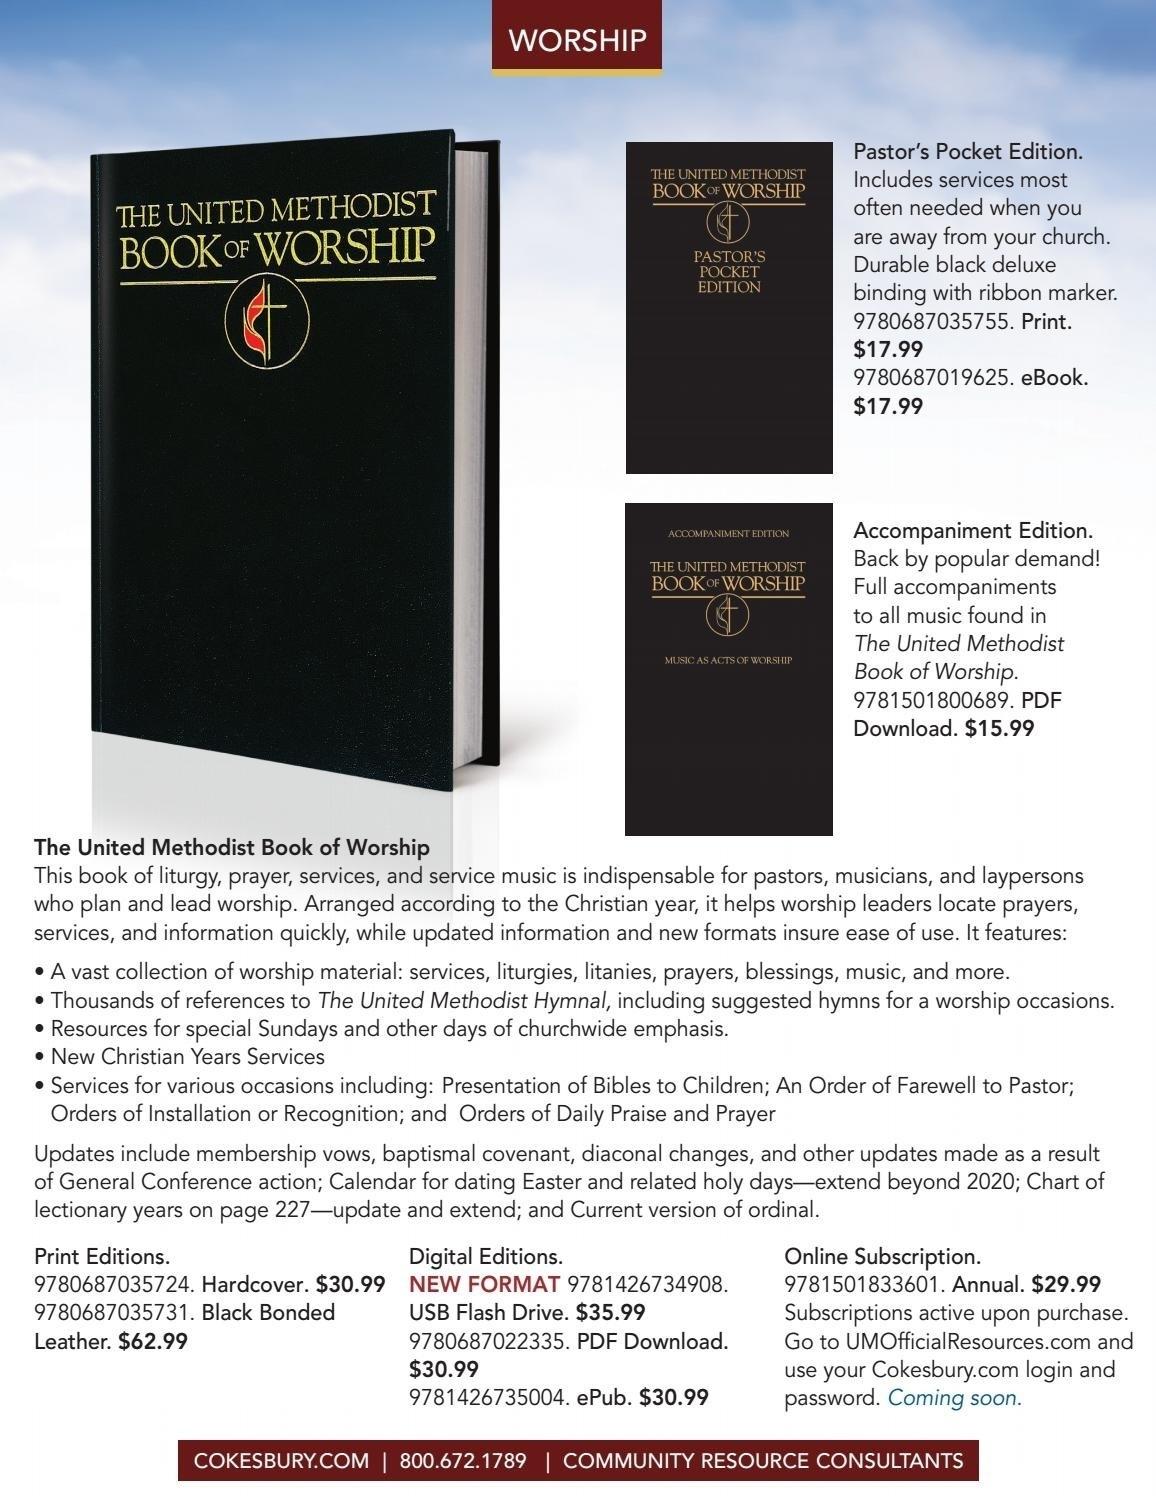 Umc 2021 Liturgical Calendarmonth | Printable Calendar  Litrugical Calendar 2021 Methodist